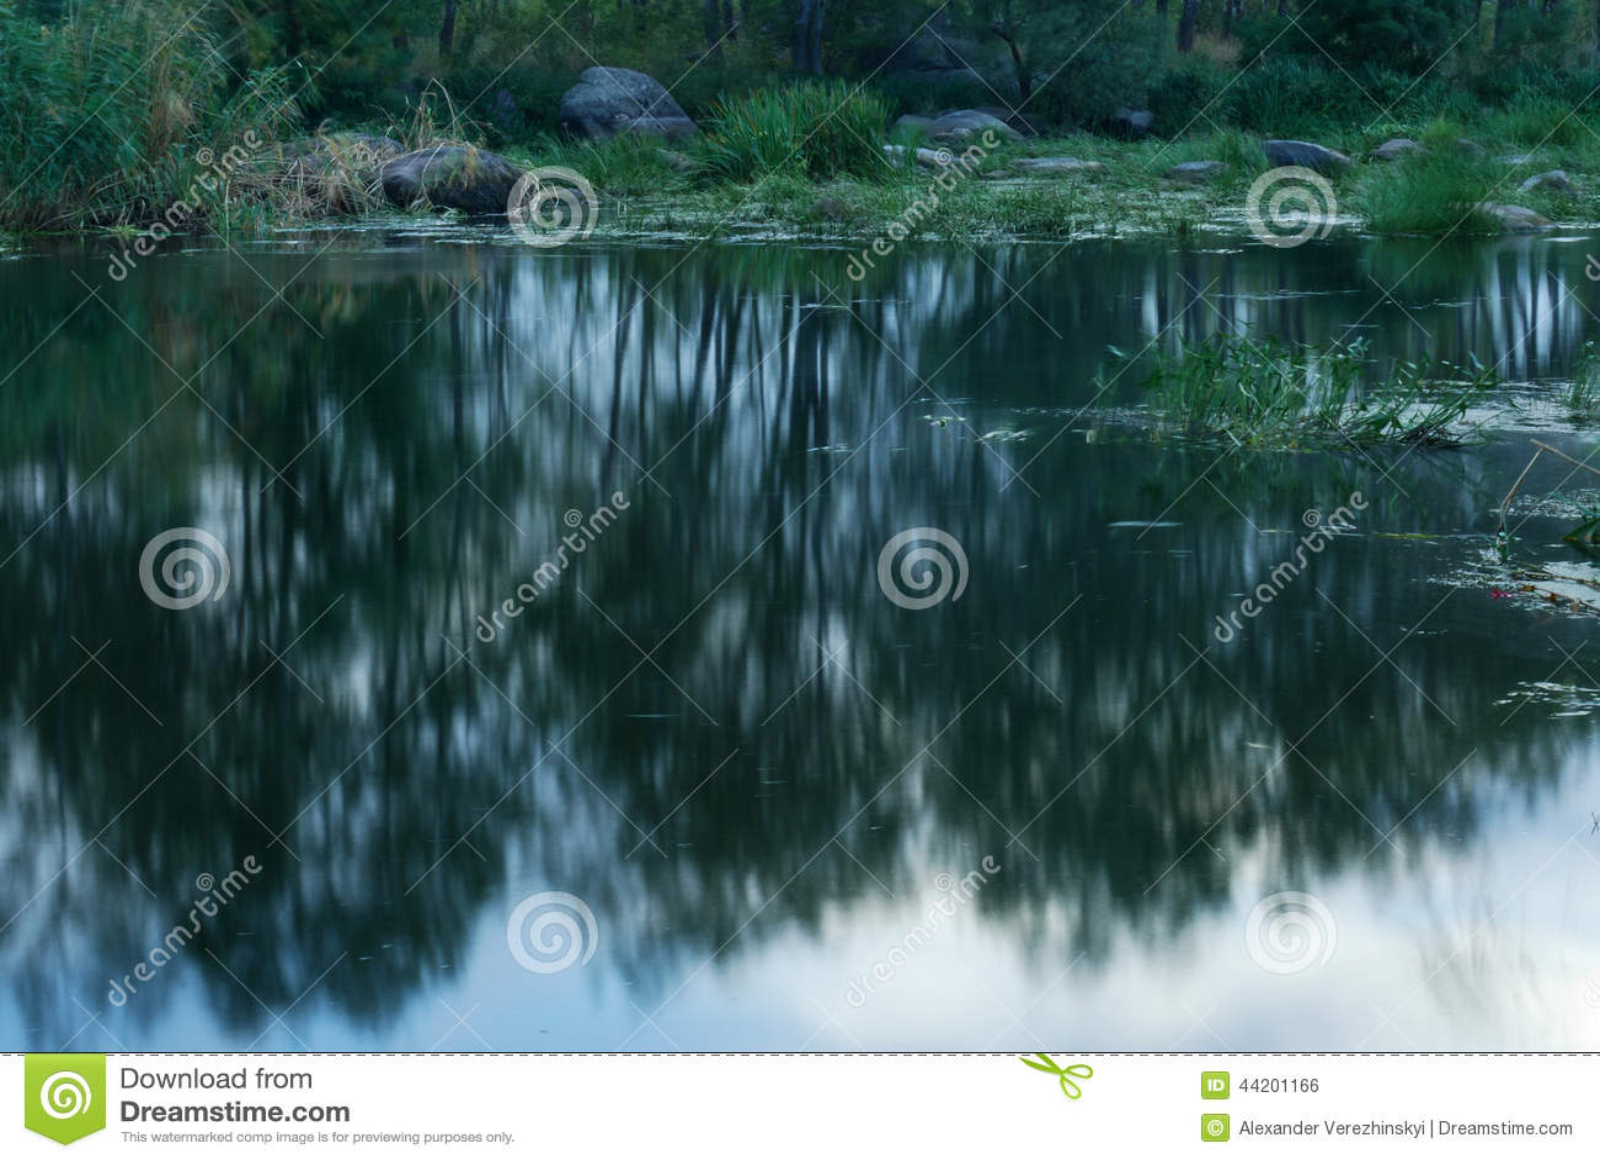 Rest on the river Bityug in the Voronezh region 12